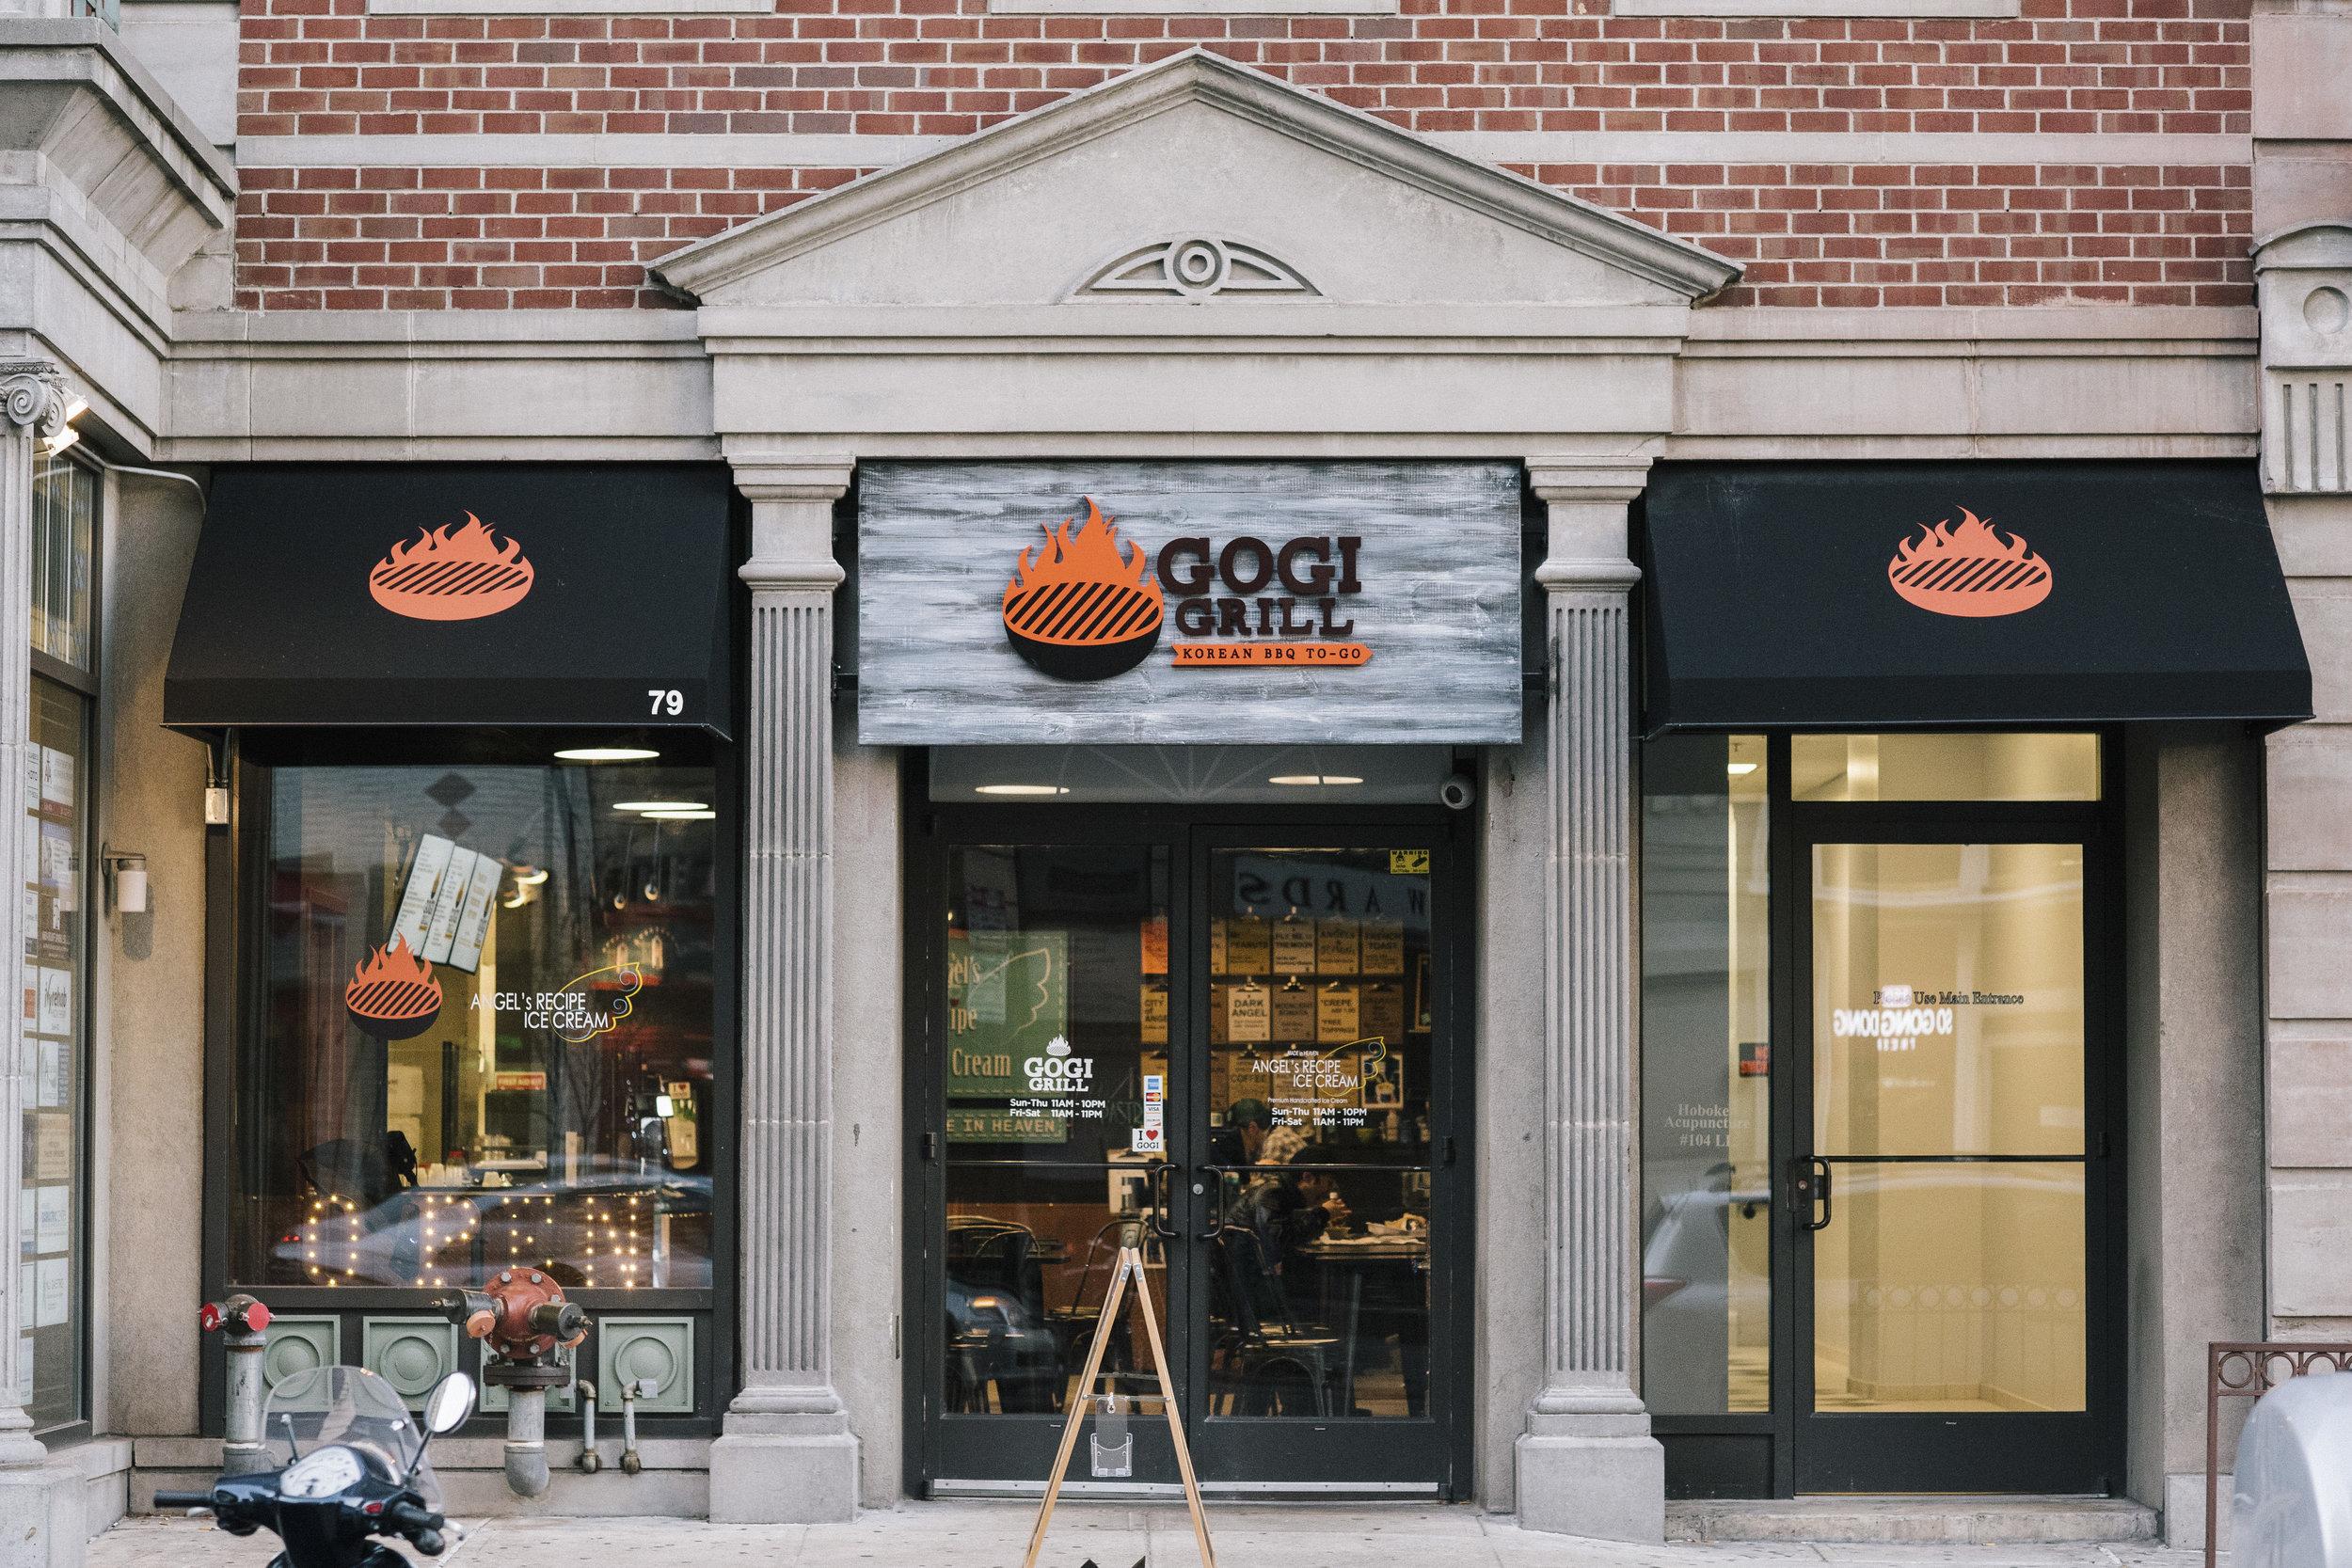 Gogi-Grill-Hoboken-Korean-BBQ-take-out-fast-food-0008.jpg